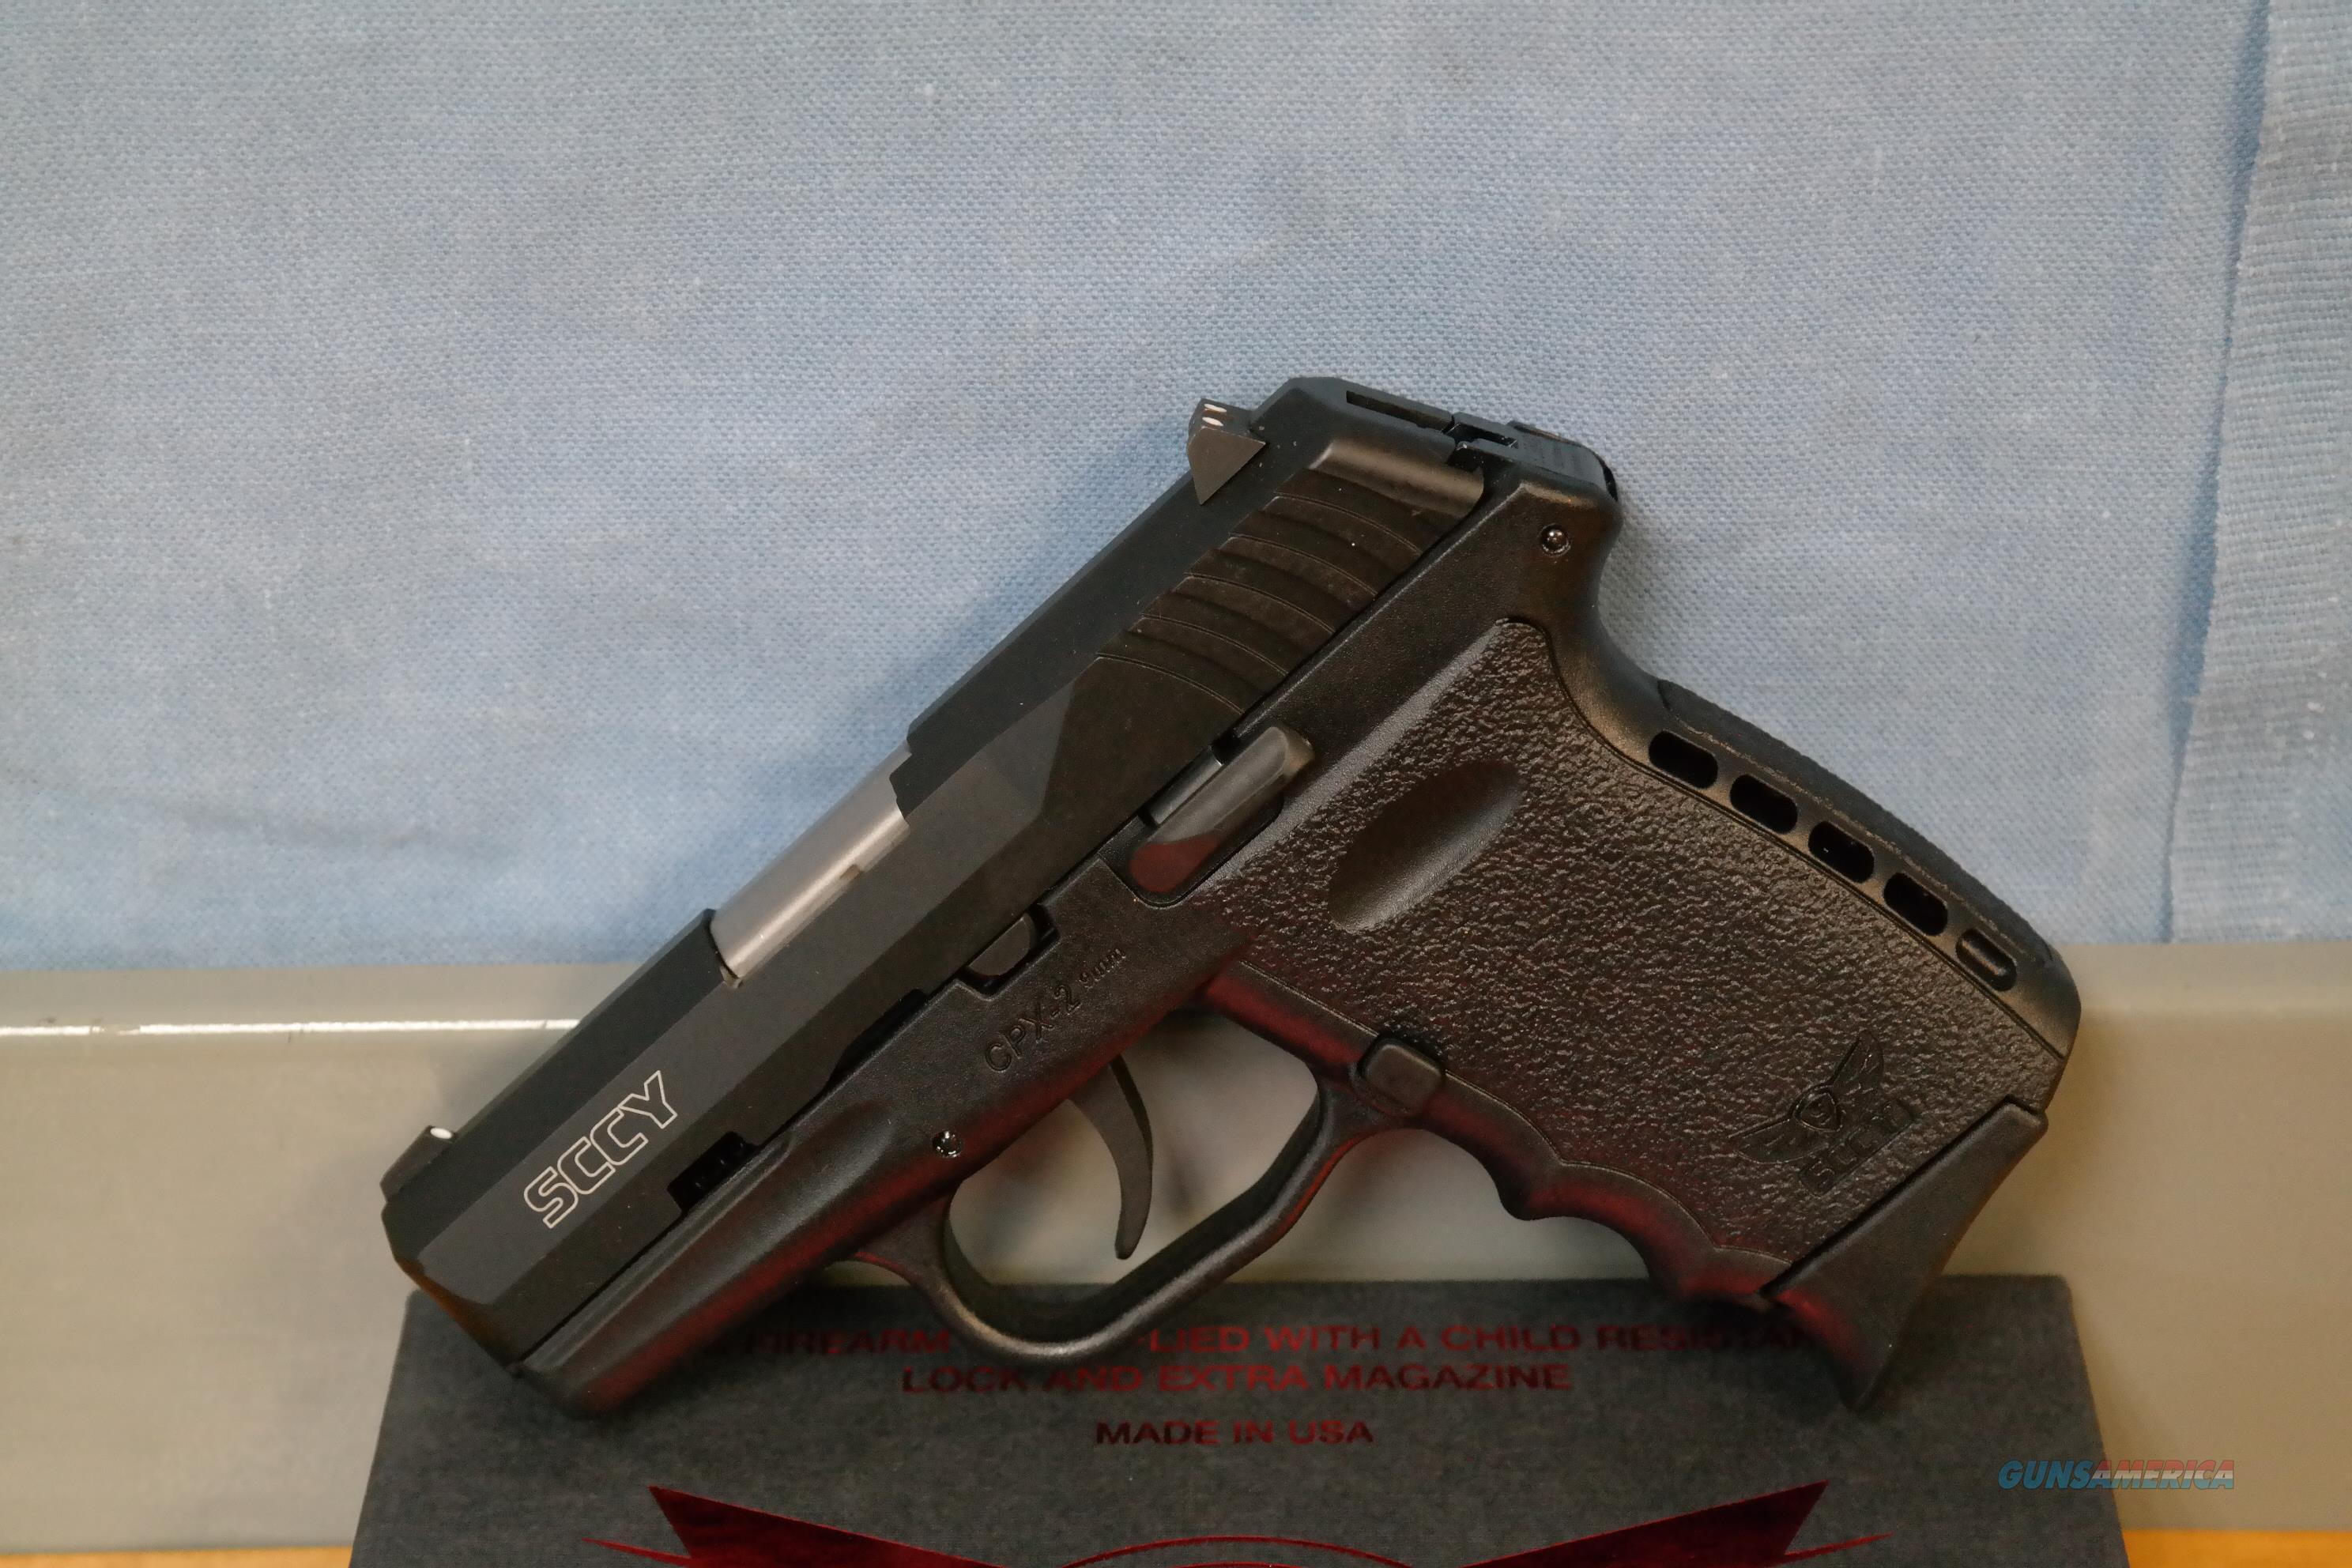 SCCY CPX-2 Carbon Black 9mm  Guns > Pistols > SCCY Pistols > CPX2